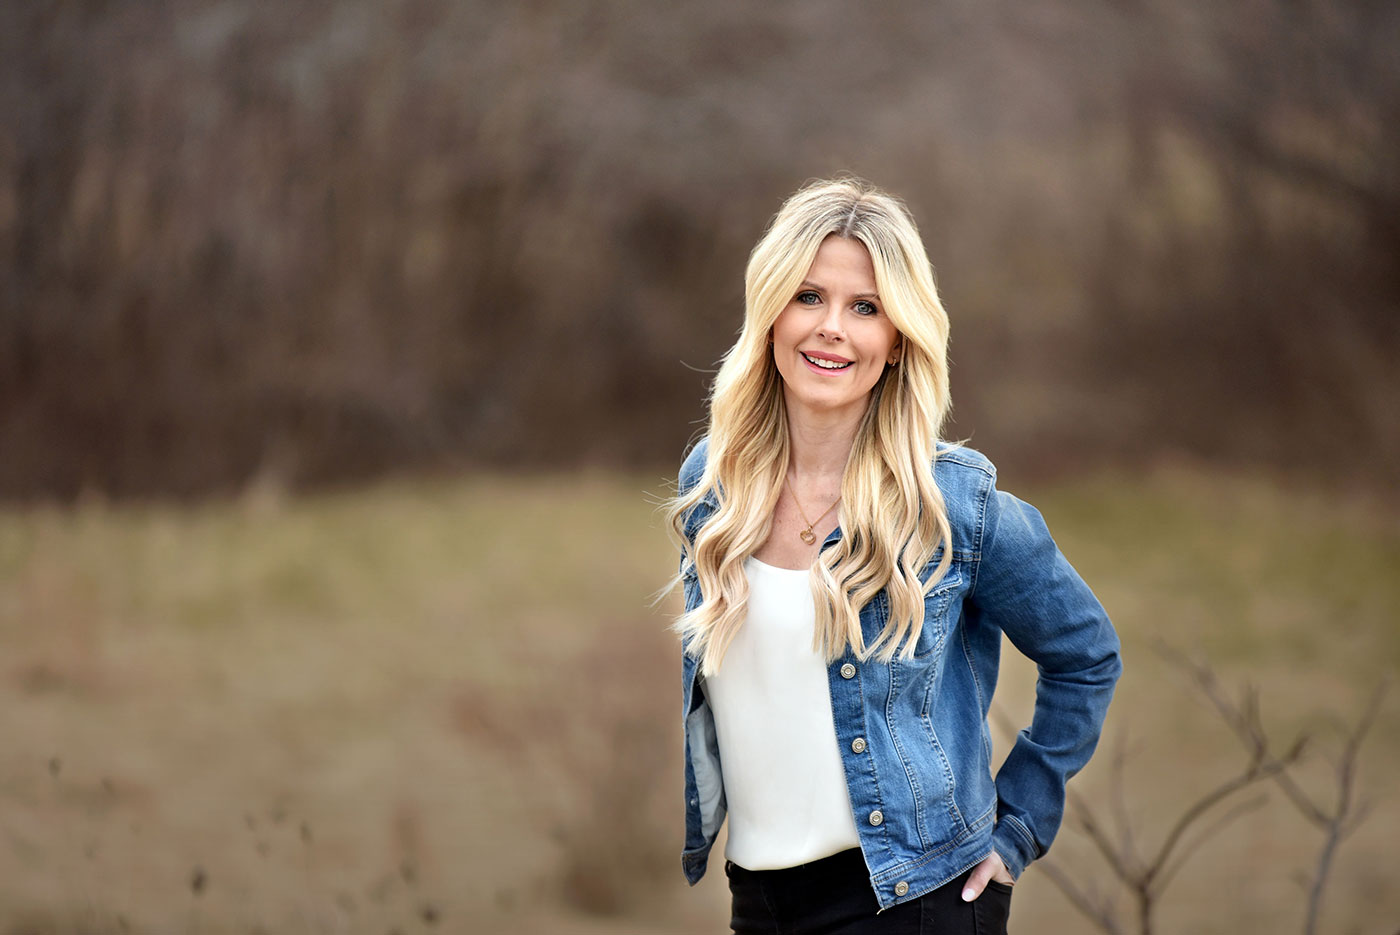 Natalie James of Vent Blow Dry Bar